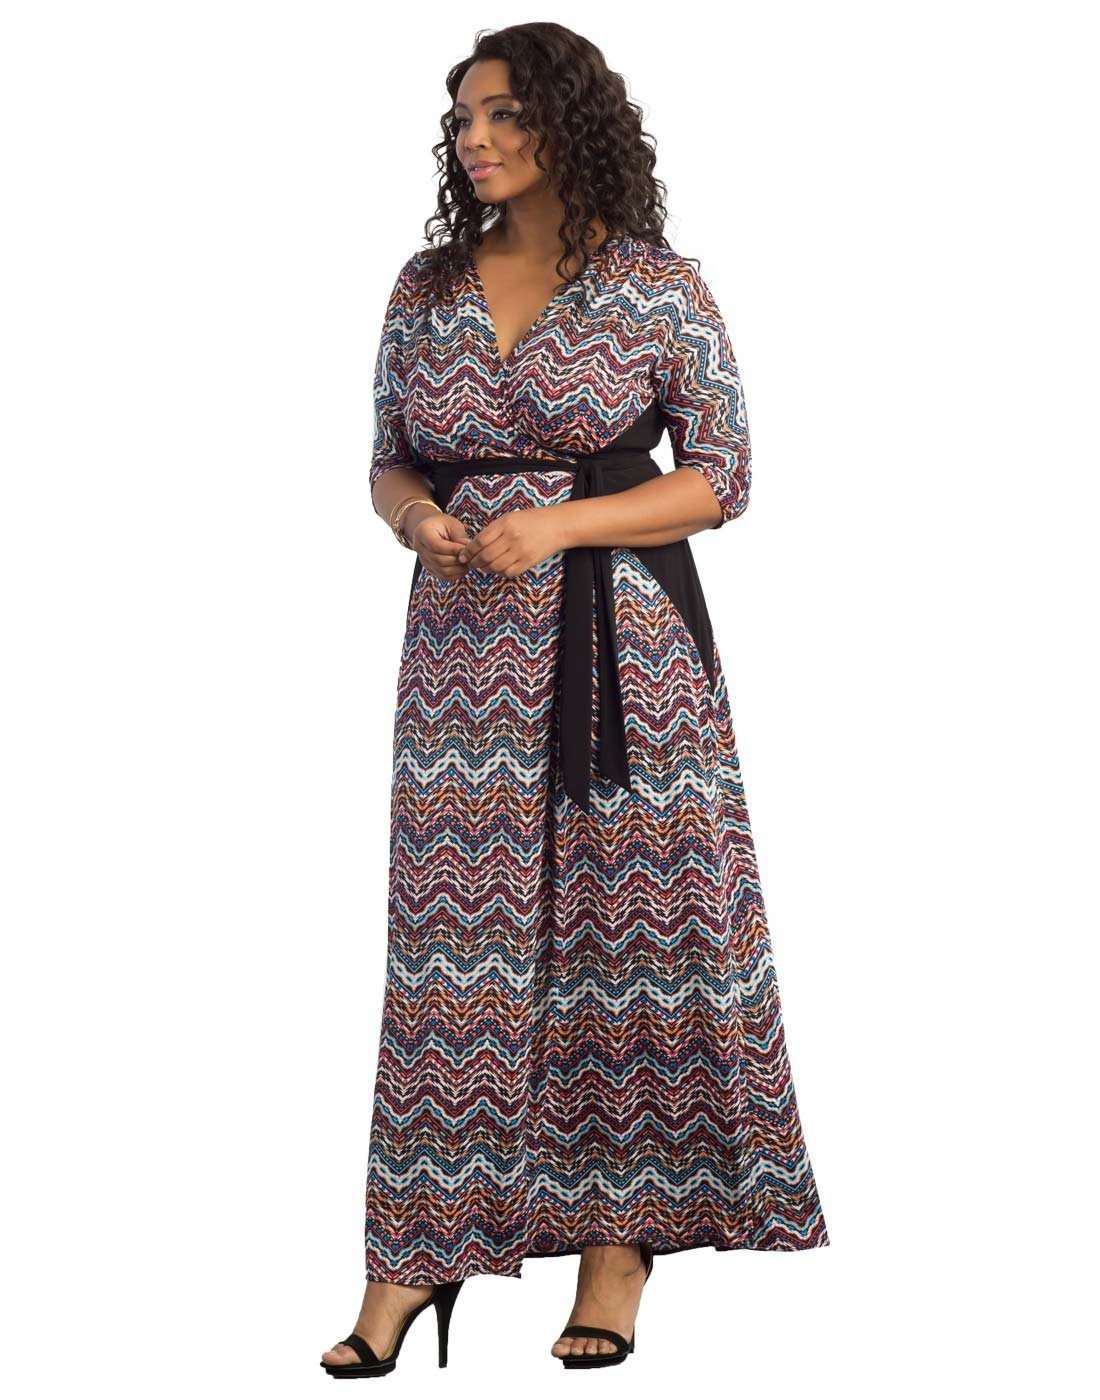 Kiyonna Women's Plus Size Moroccan Maxi Wrap Dress 2X Chevron Mix Print